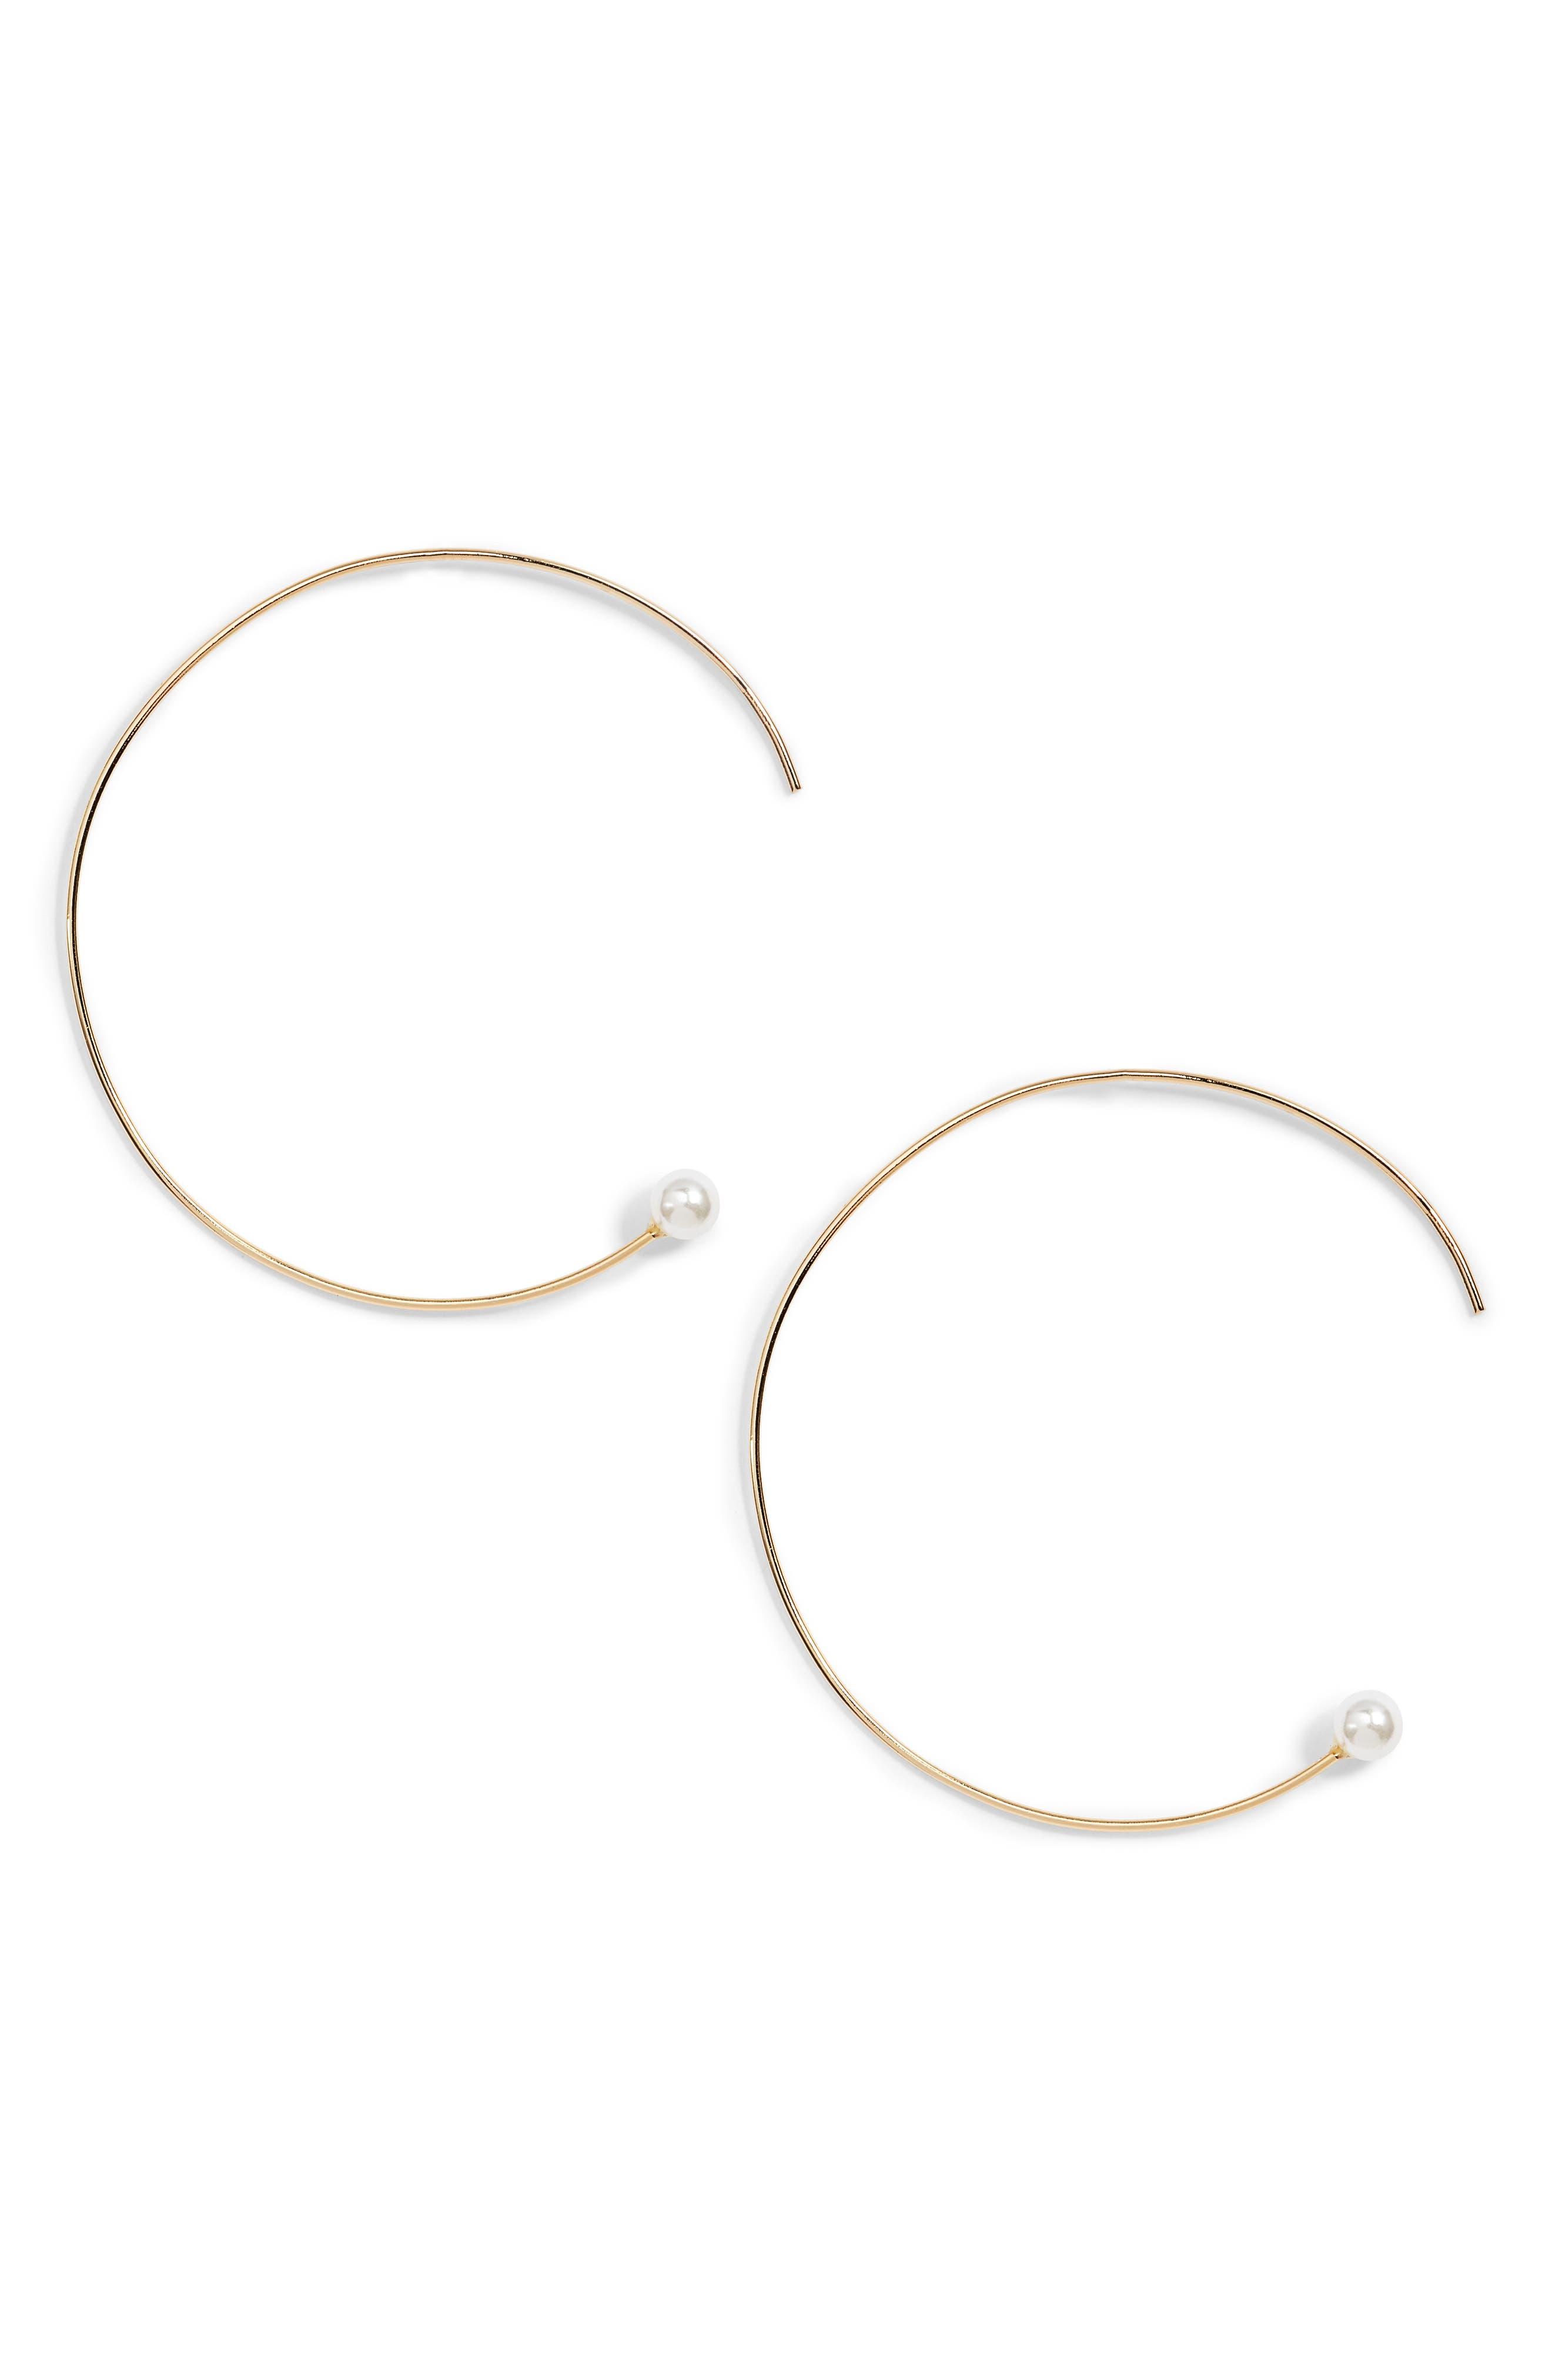 Jules Smith Yoshi Imitation Pearl Hoop Earrings